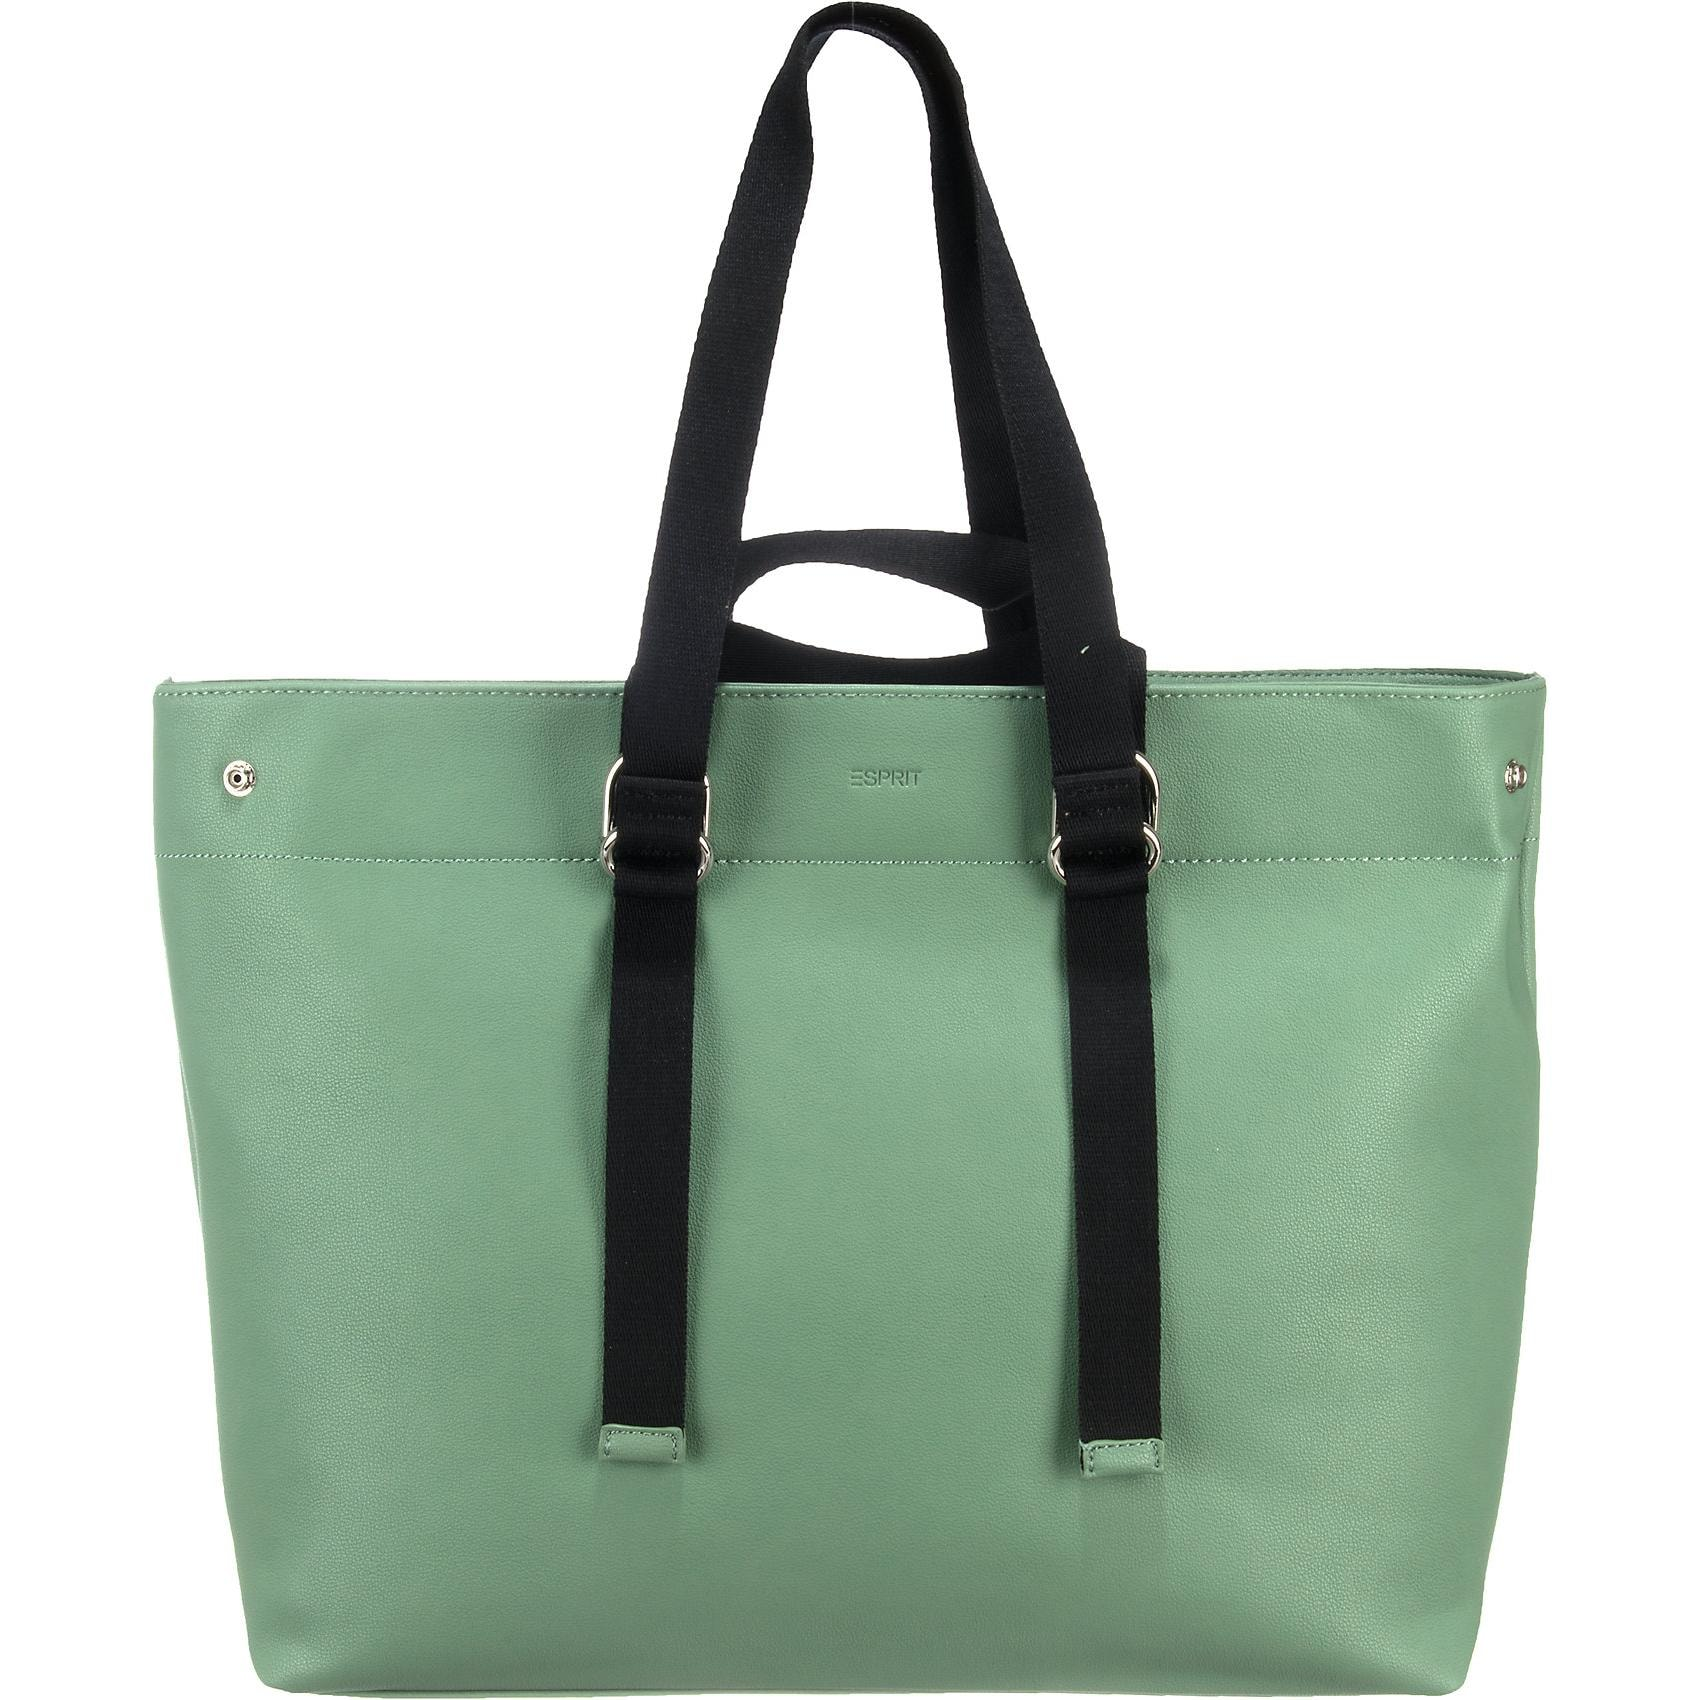 8499747fbb13a Handtaschen online bestellen » REWE